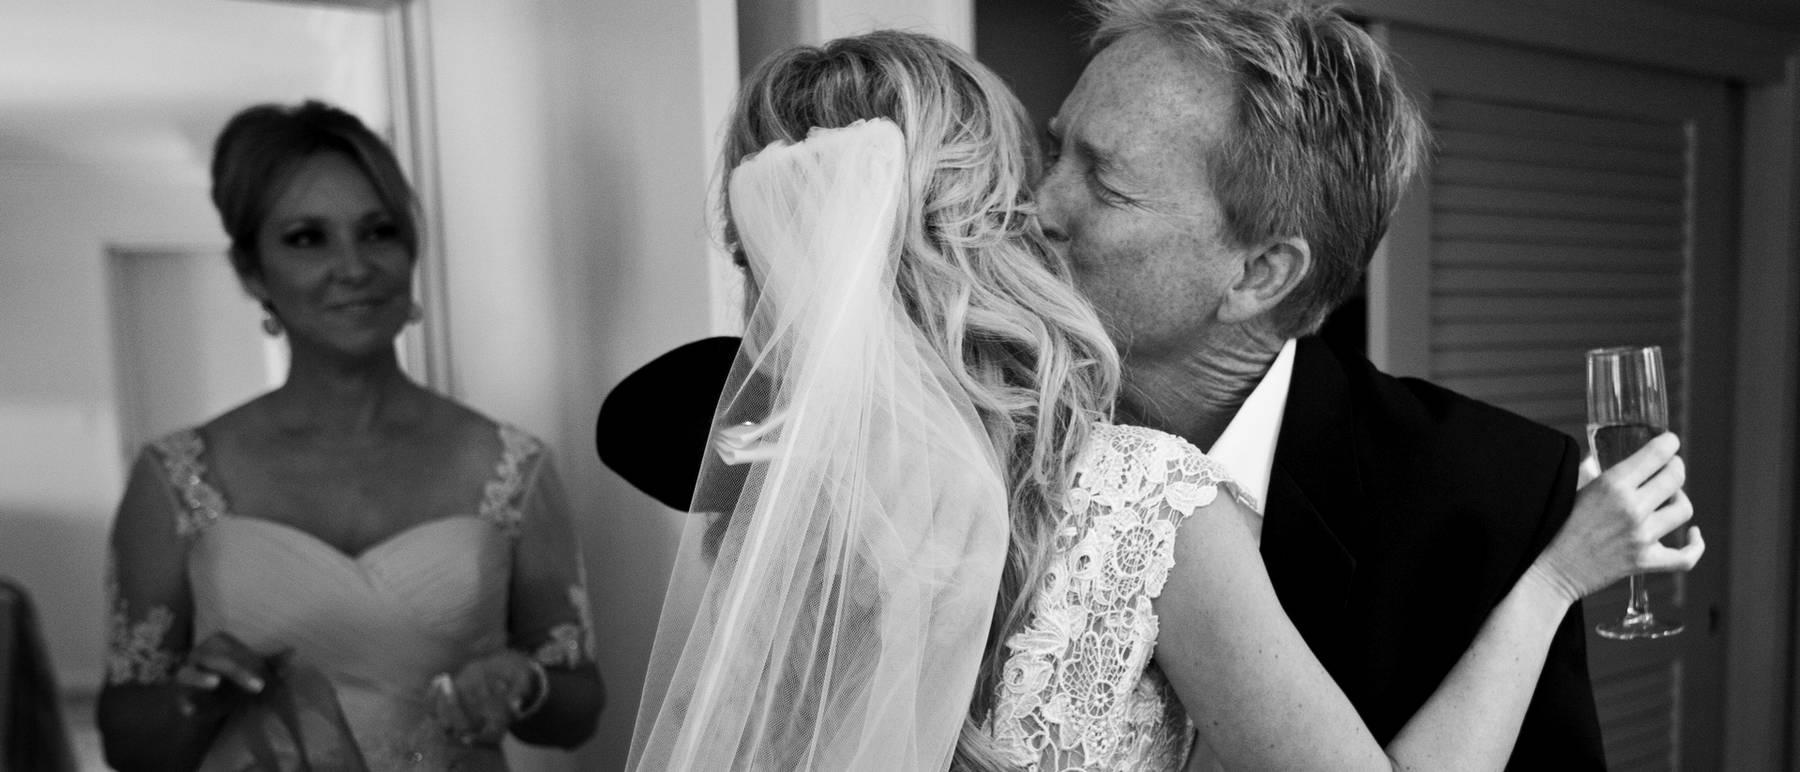 johnandjoseph-wedding-photographer-hz-slider-306